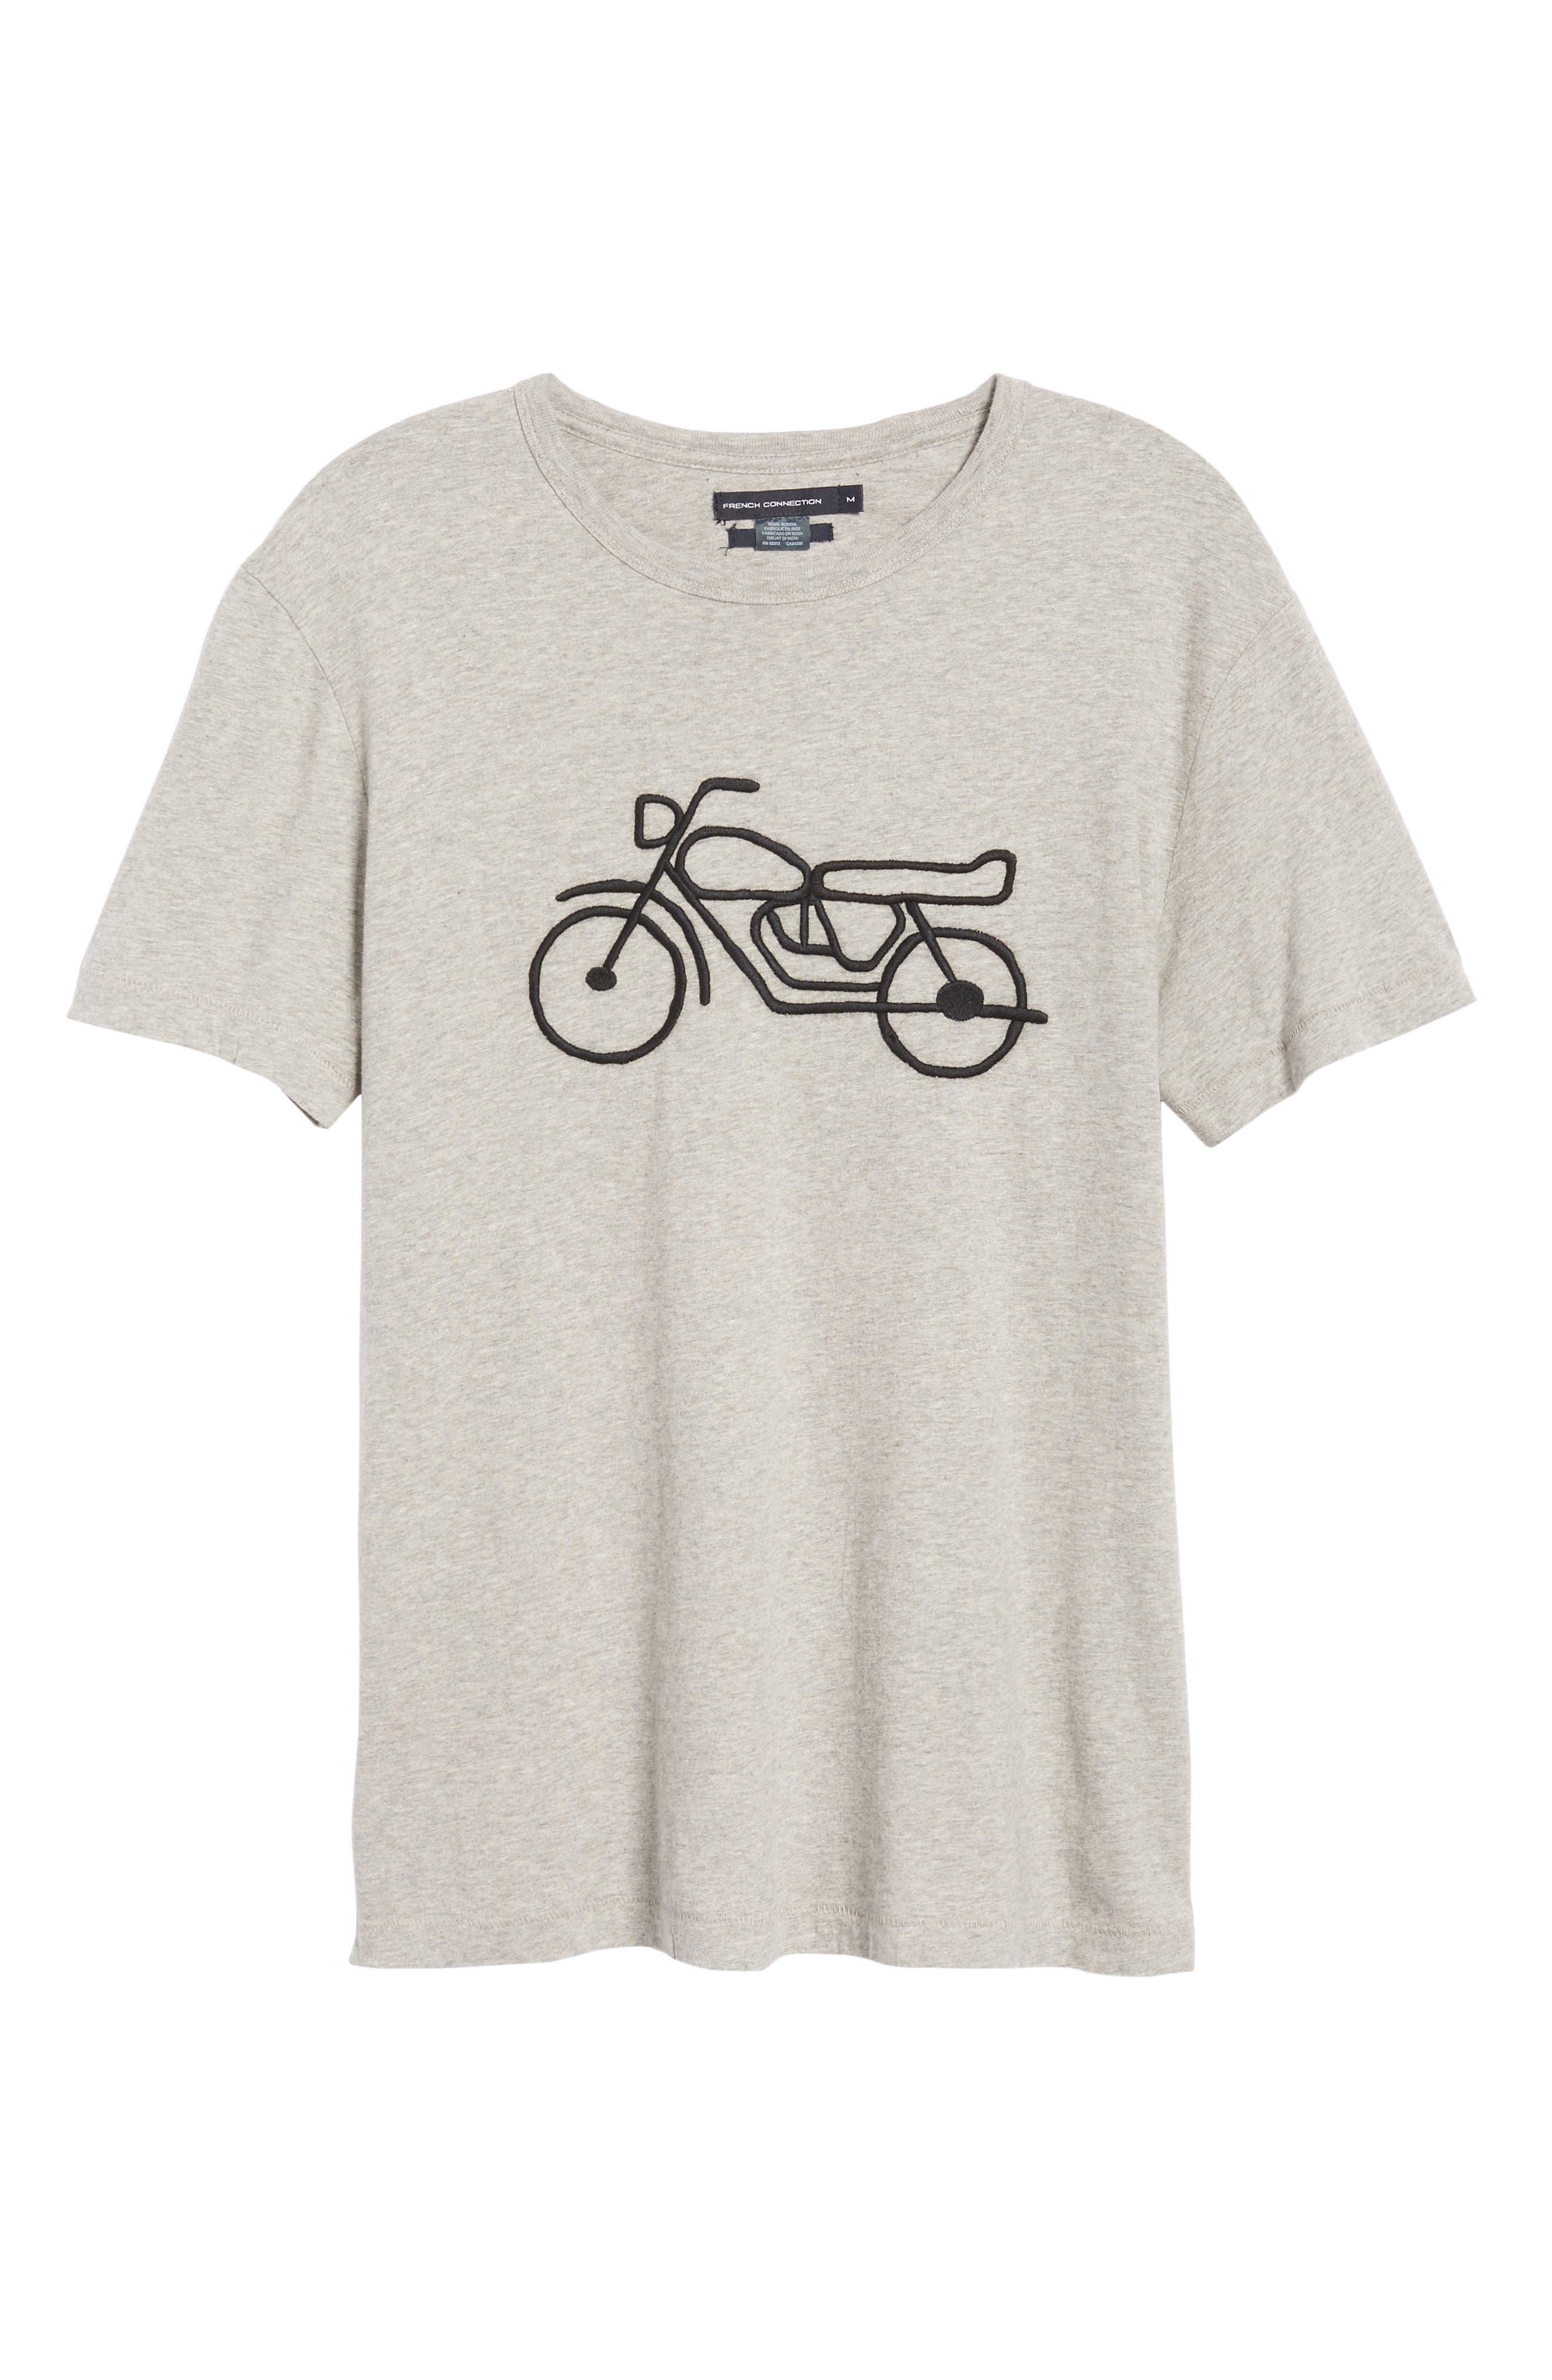 Motorcycle Regular Fit Cotton T-Shirt,                             Alternate thumbnail 6, color,                             GREY MELANGE BLACK